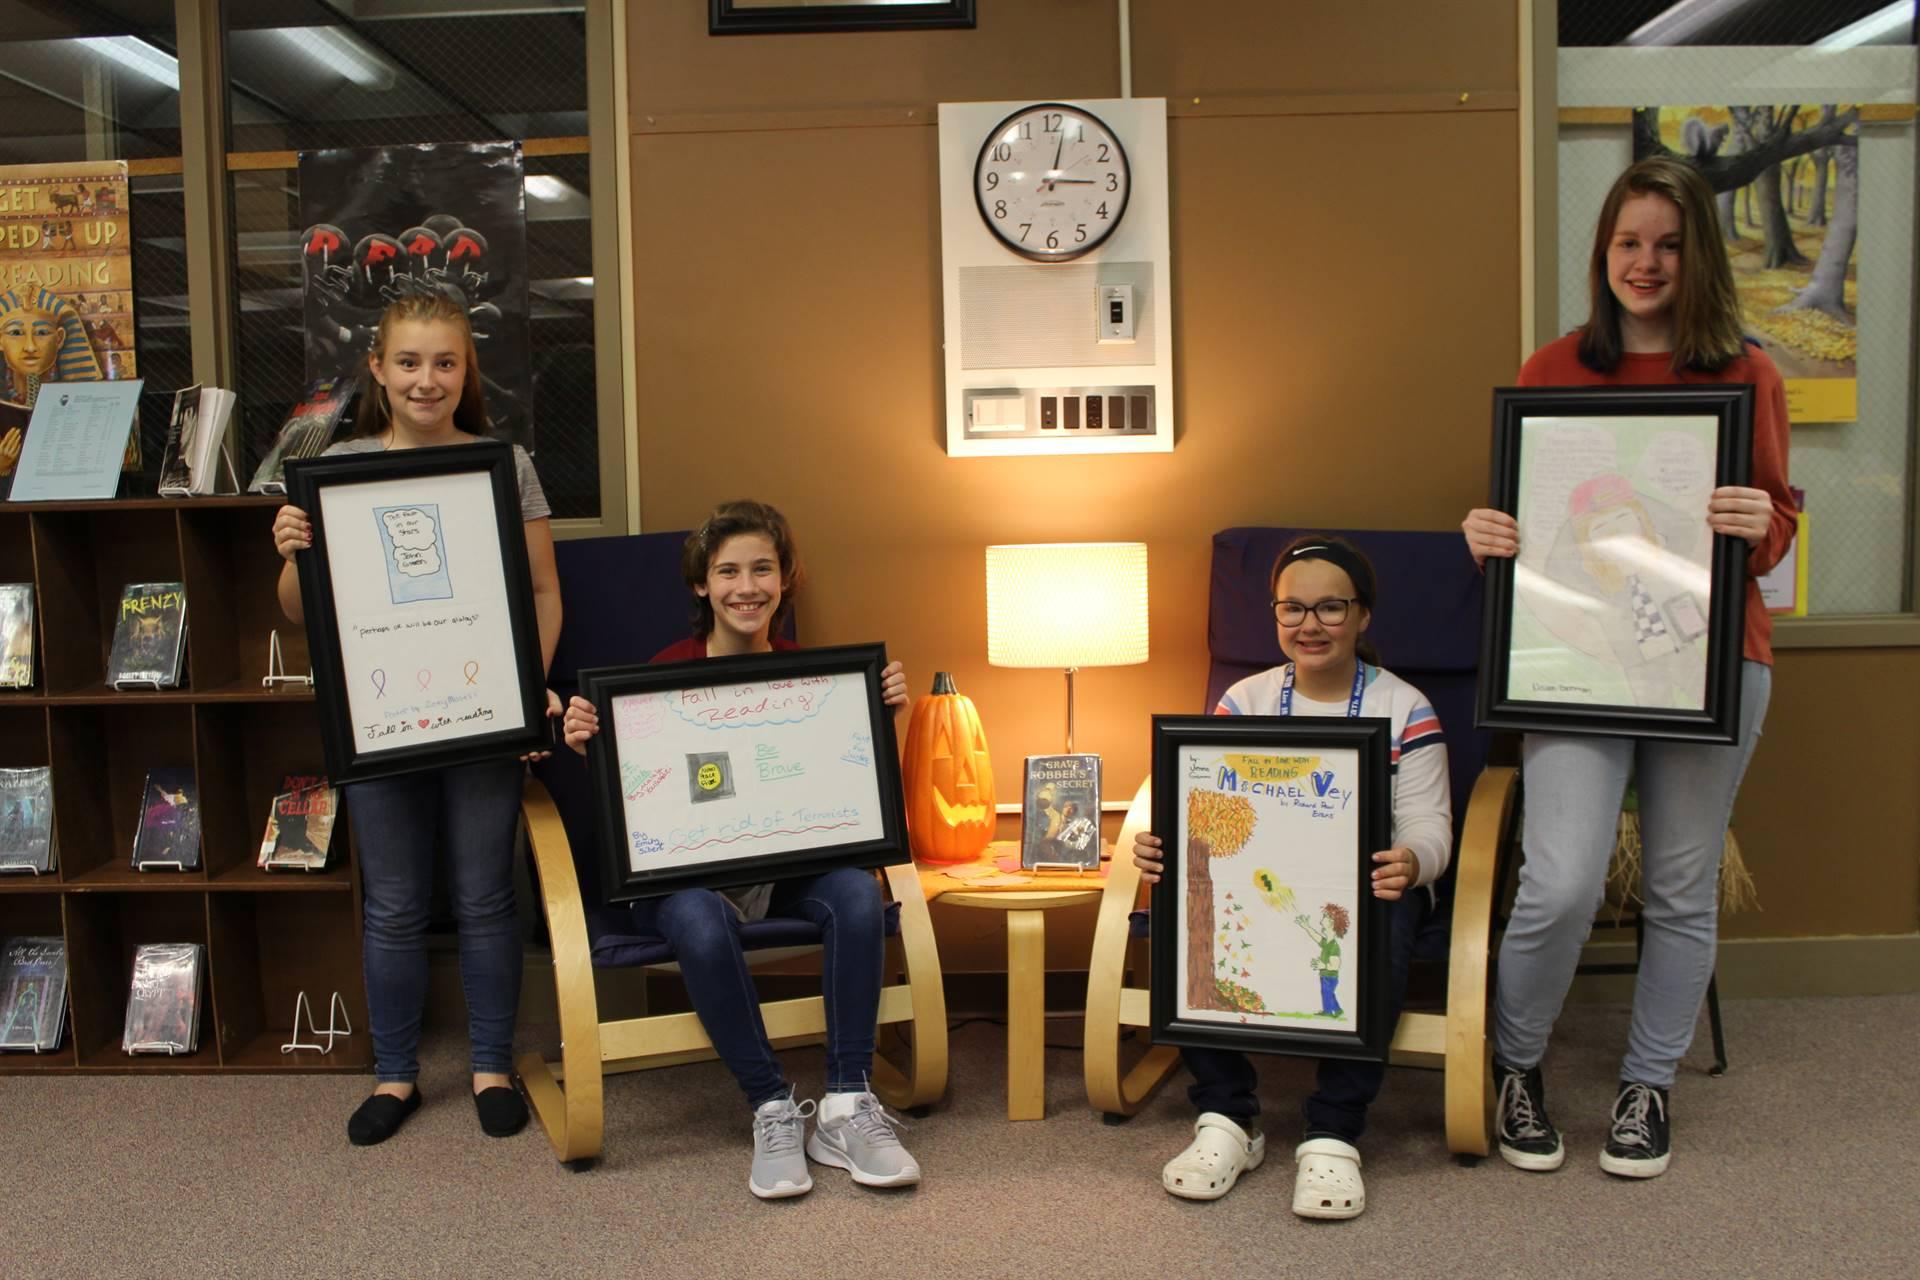 Poster Winners - Naveah B, Emily S, Zoey M, Jenna G